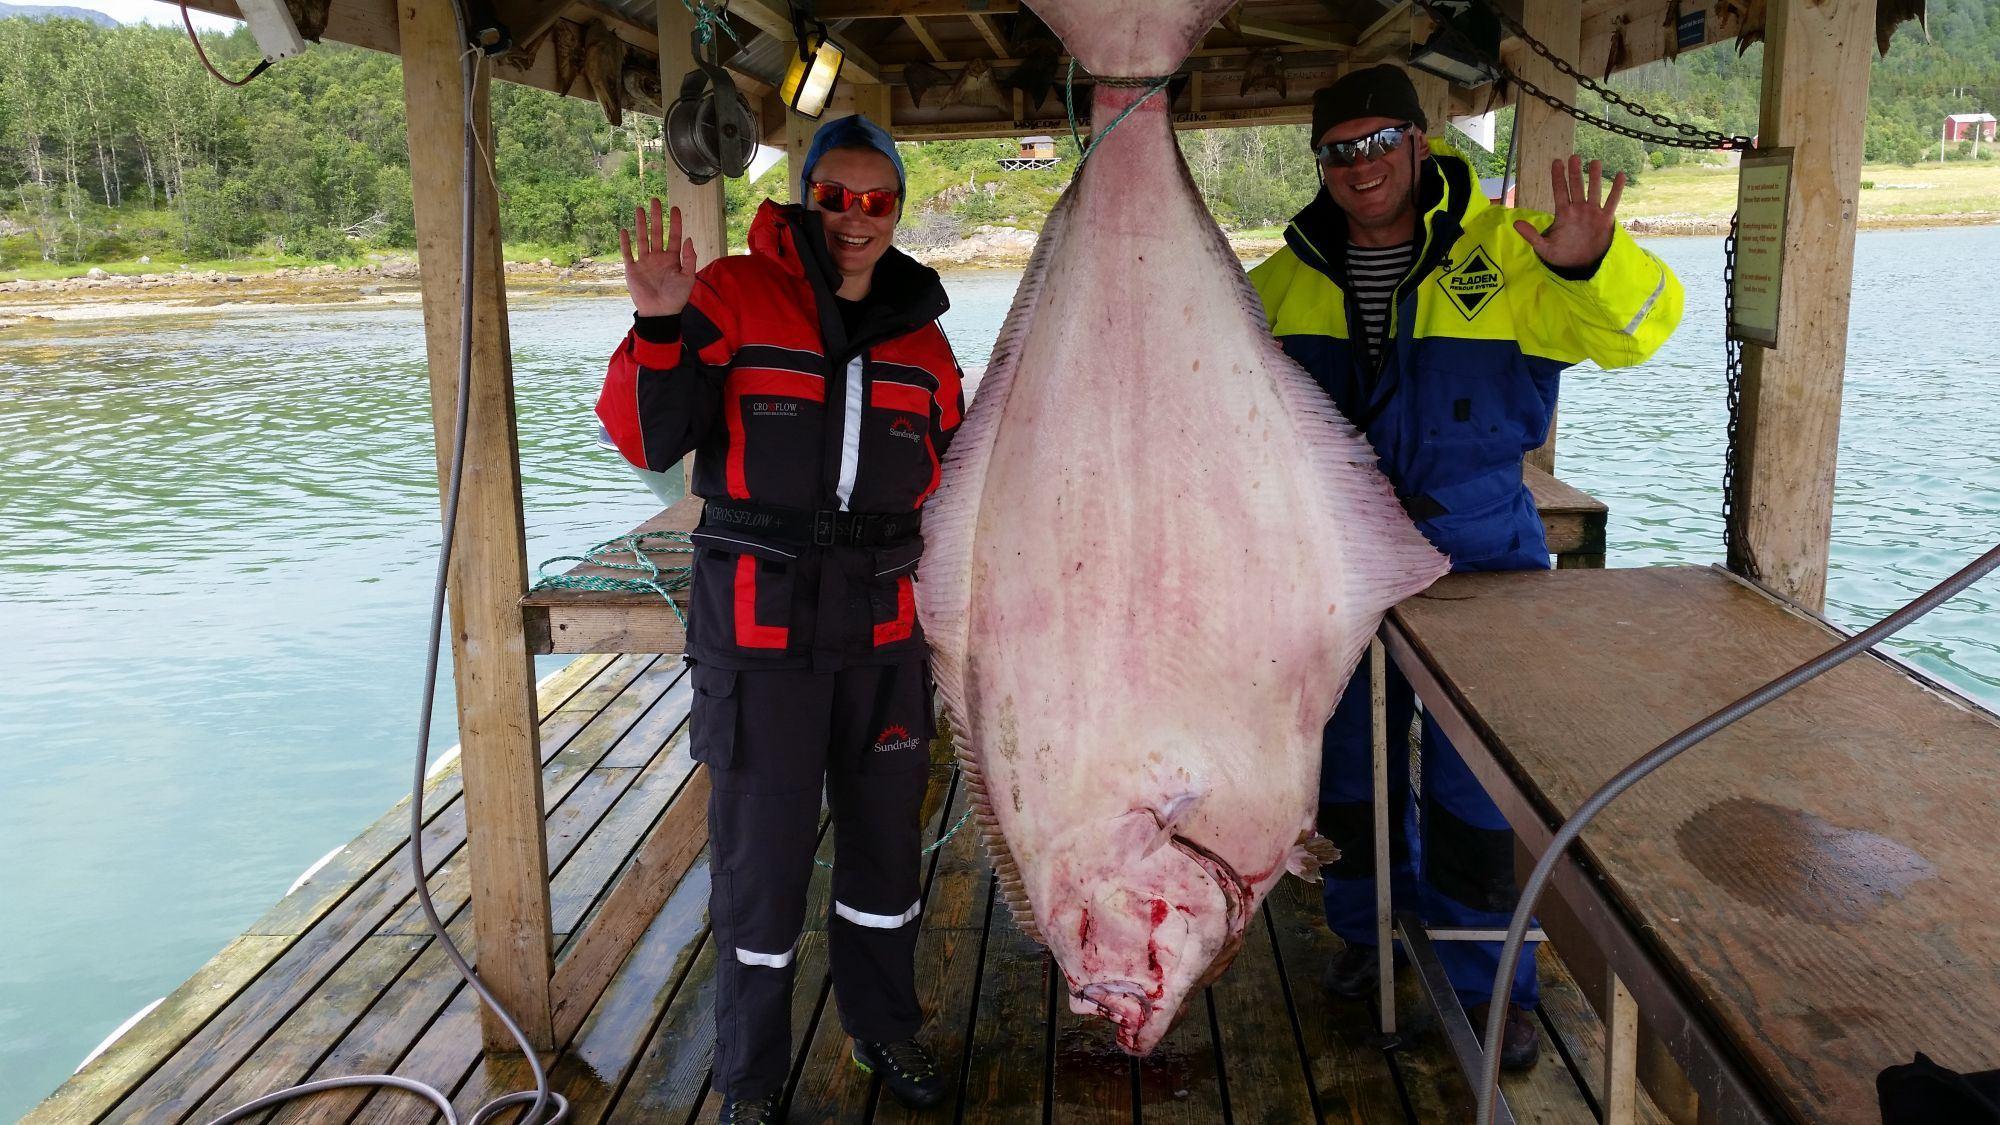 Frovåg Havfiske